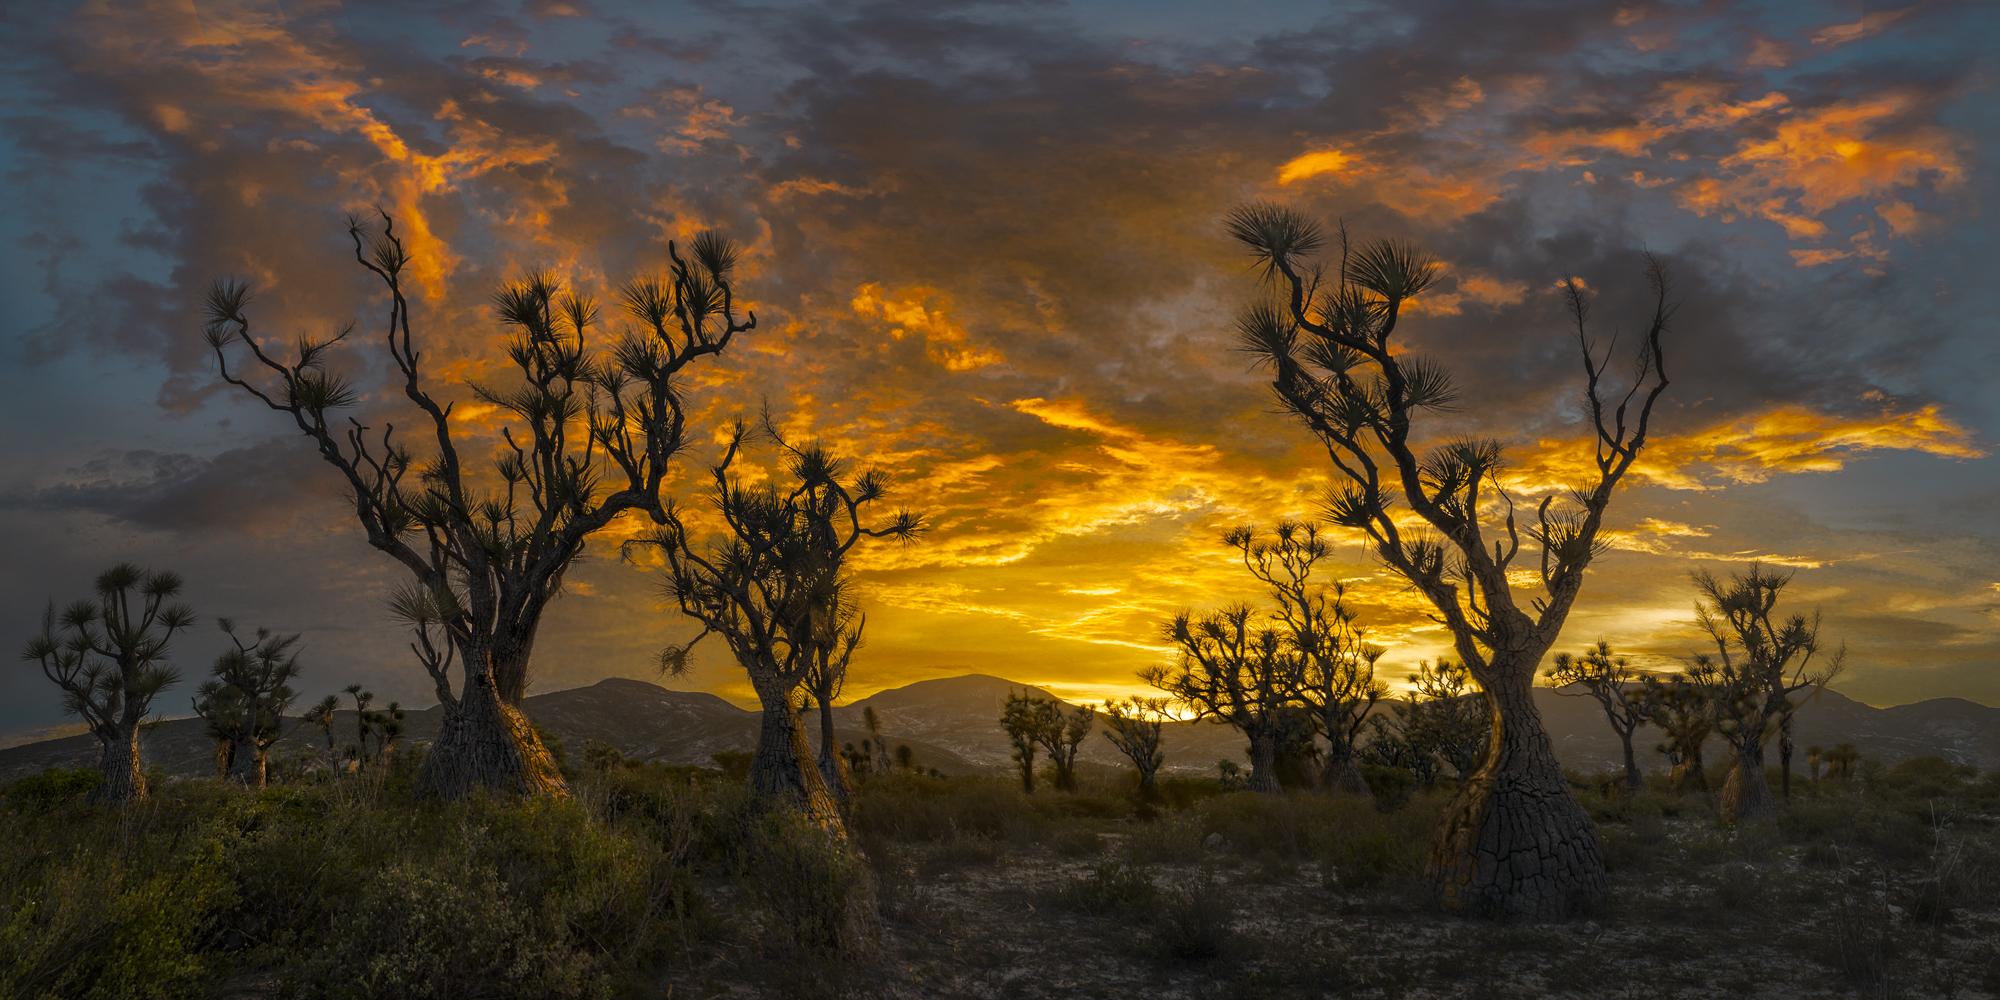 Sotolines-After-Sunset